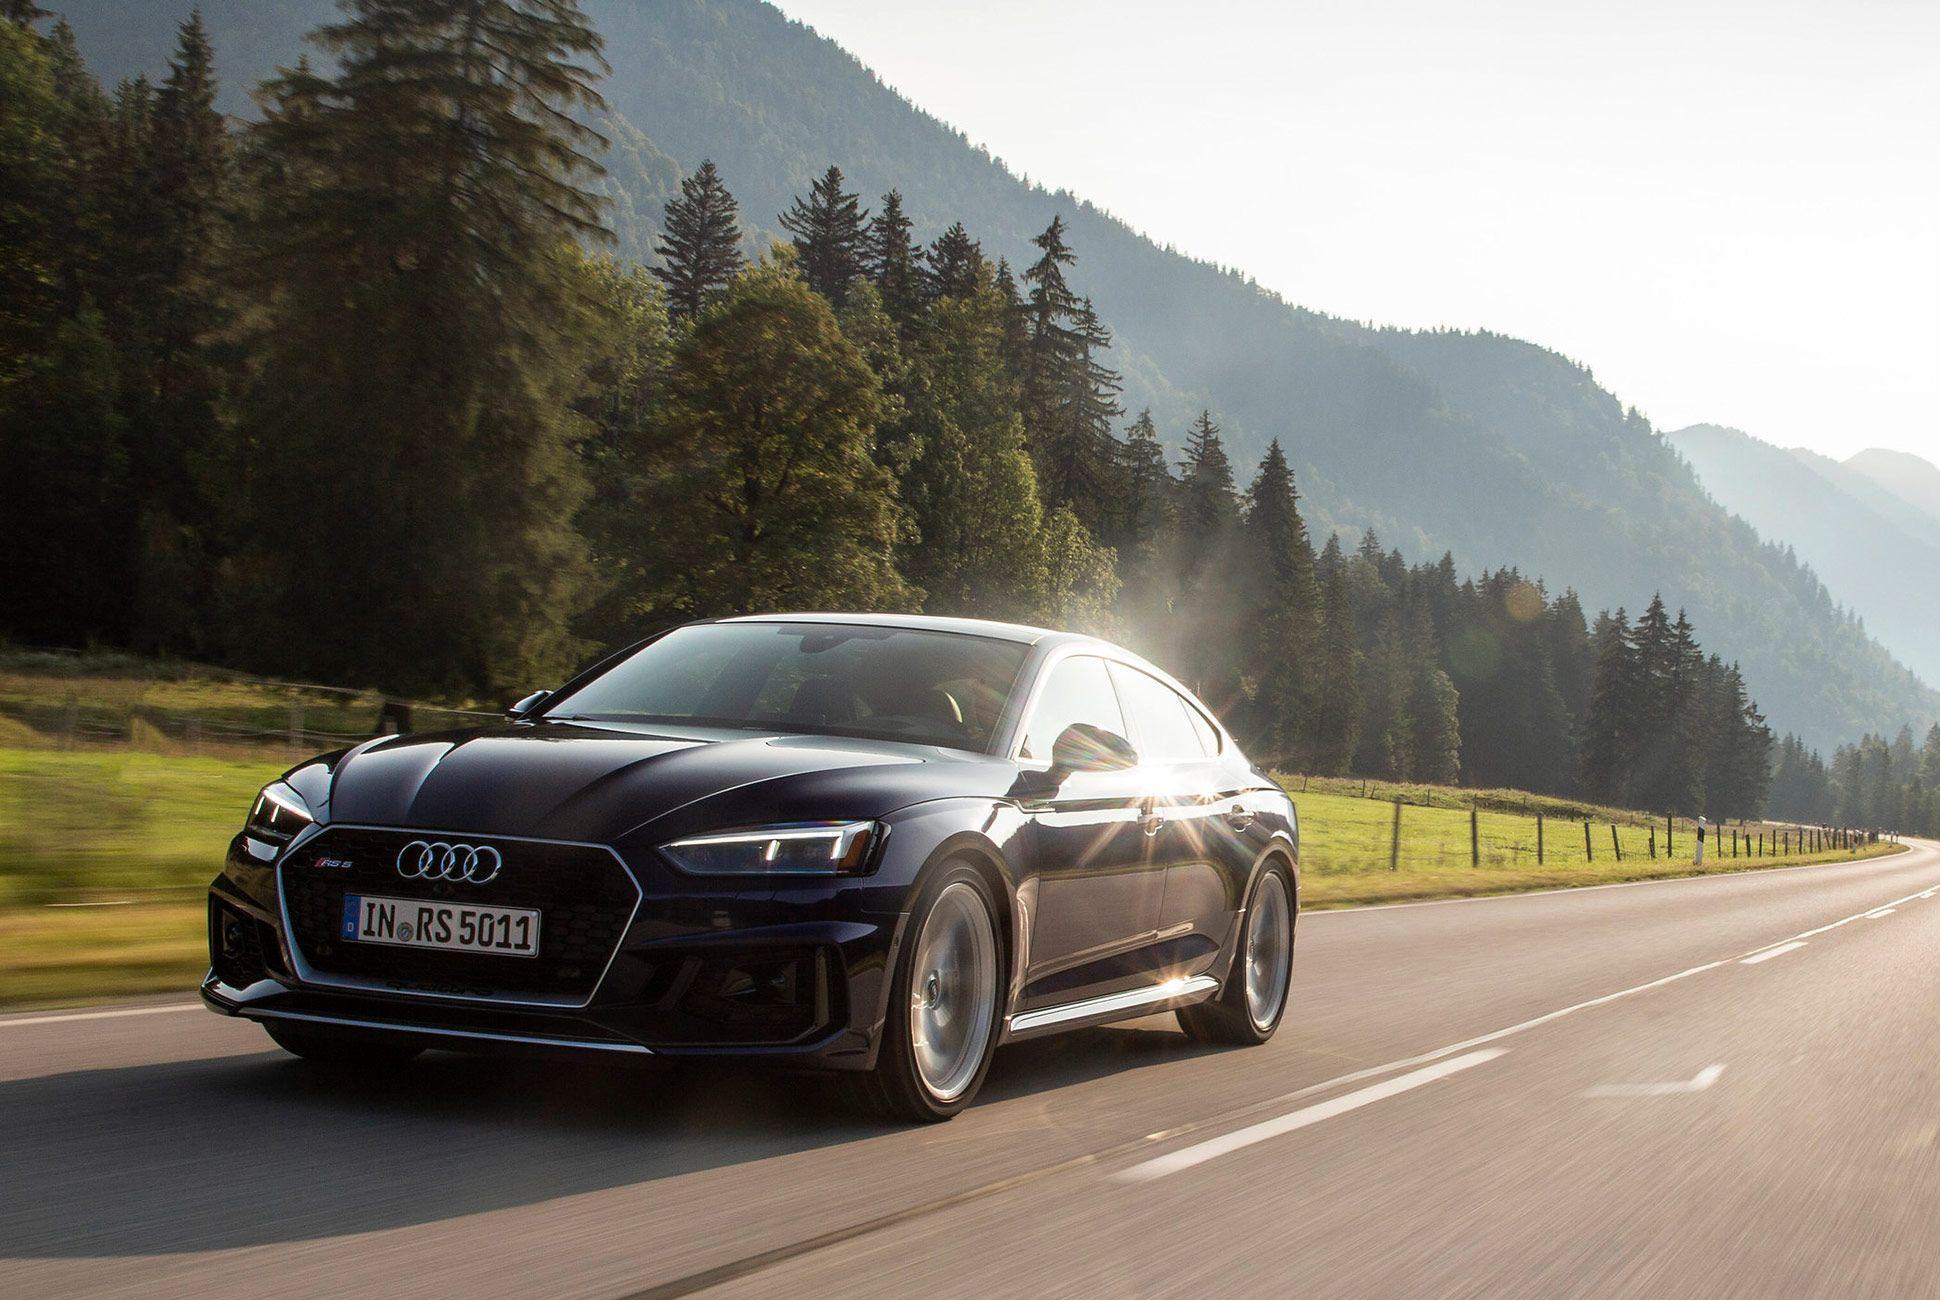 Audi-RS5-Sportback-Review-gear-patrol-slide-6